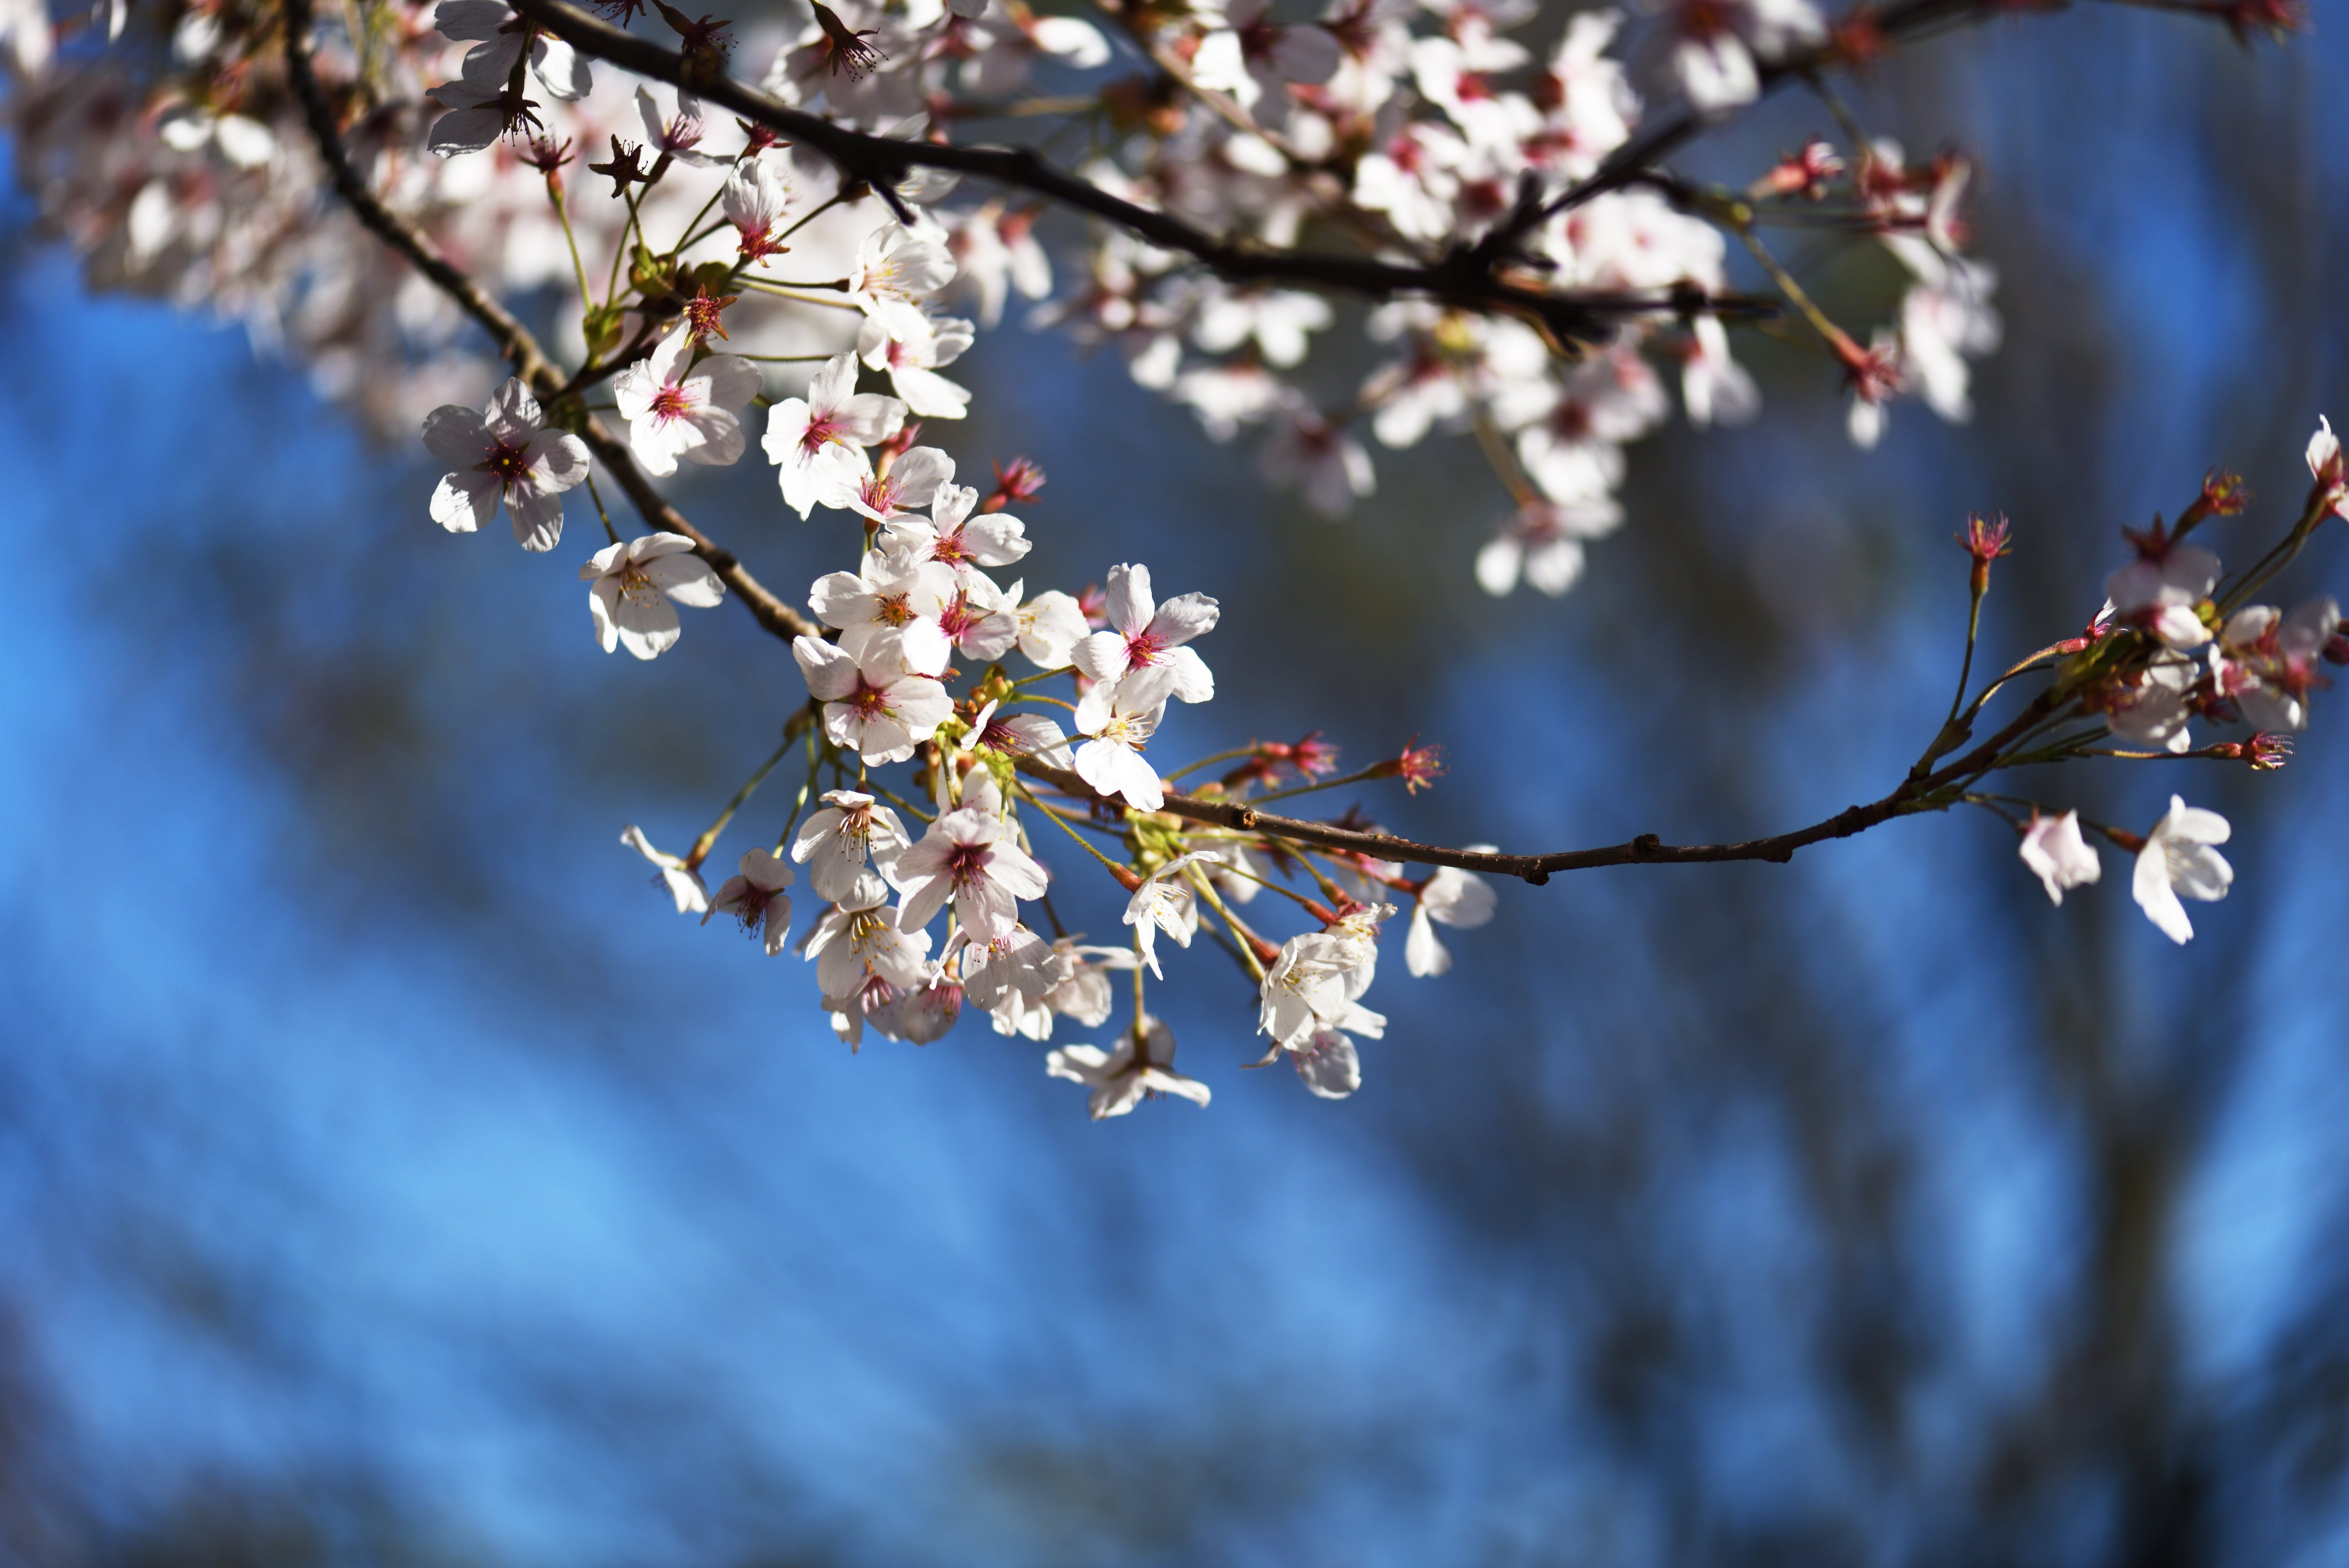 Free stock photo of beautiful flowers, blue background, cherry blossom, desktop background